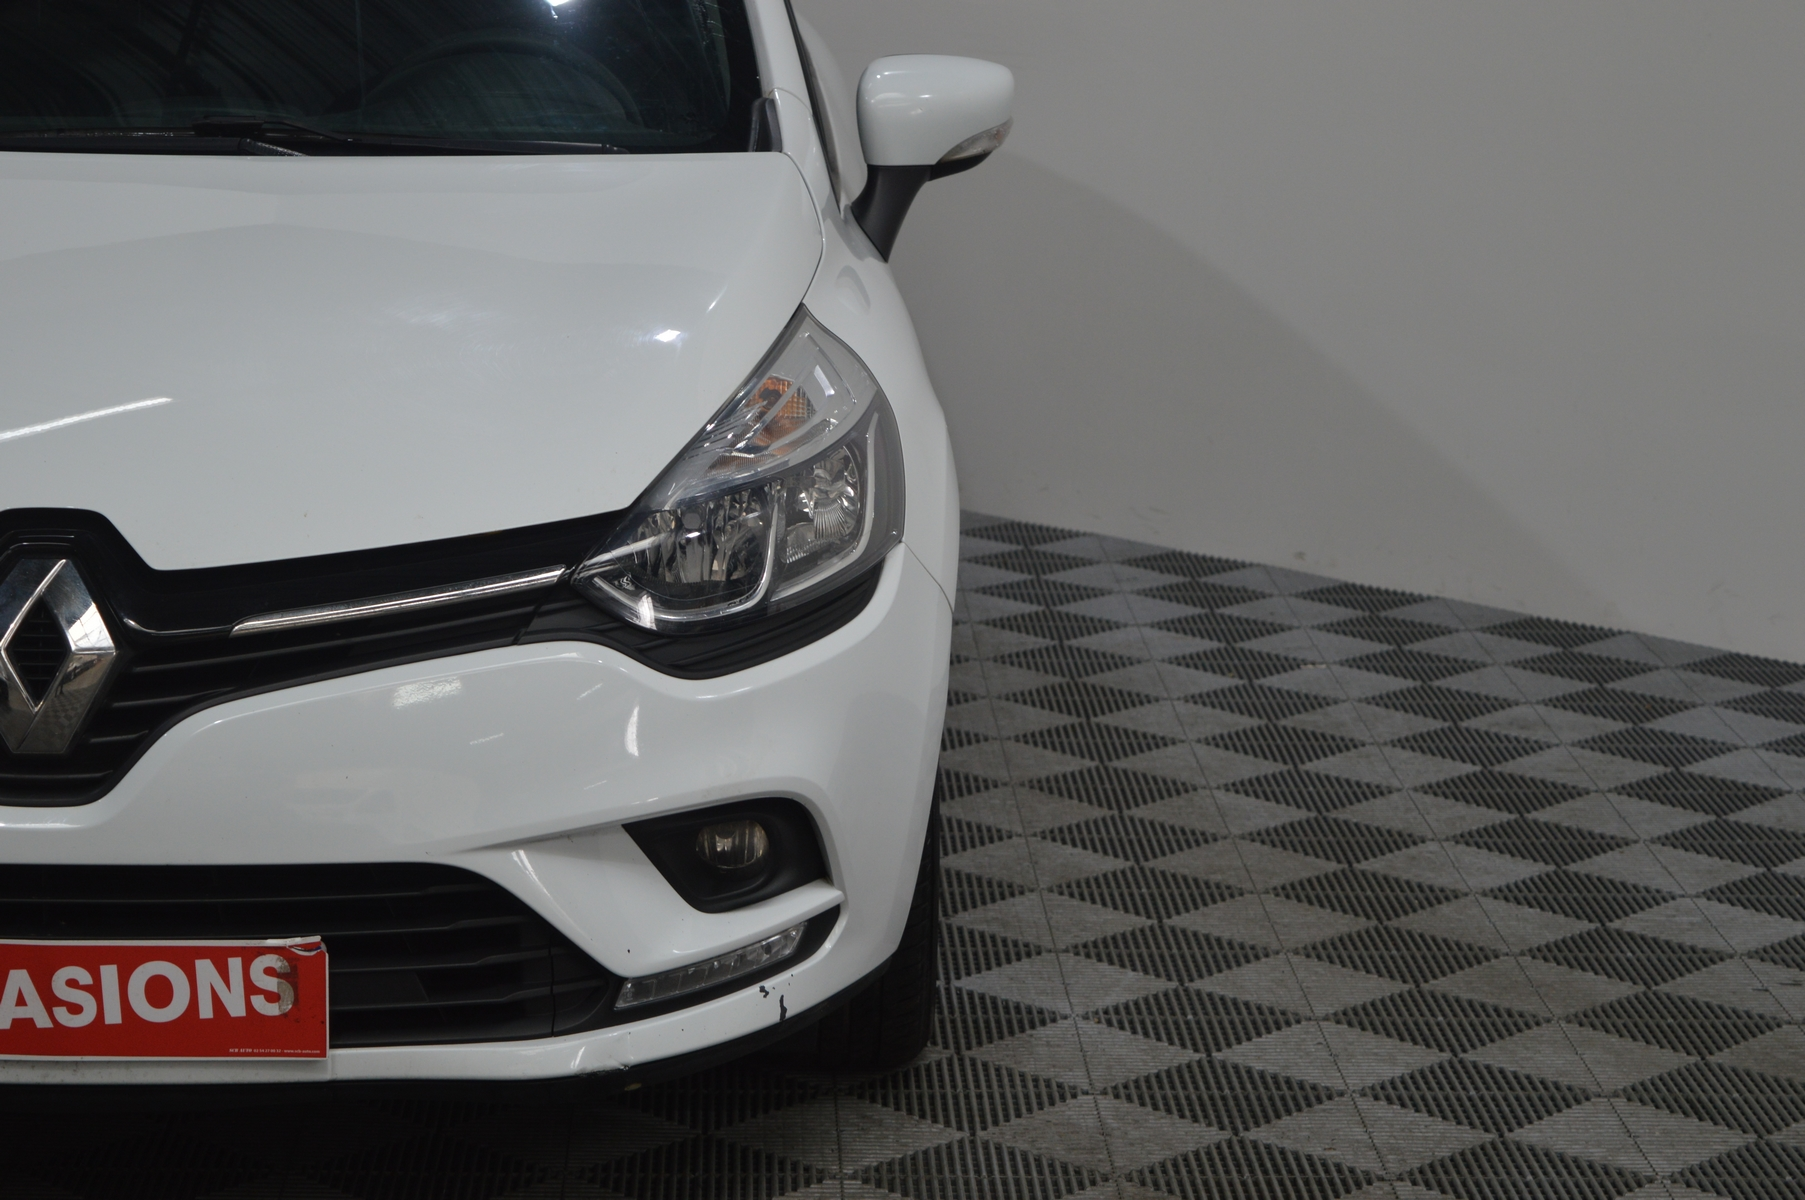 RENAULT CLIO IV SOCIETE 2018 à 7900 € - Photo n°30